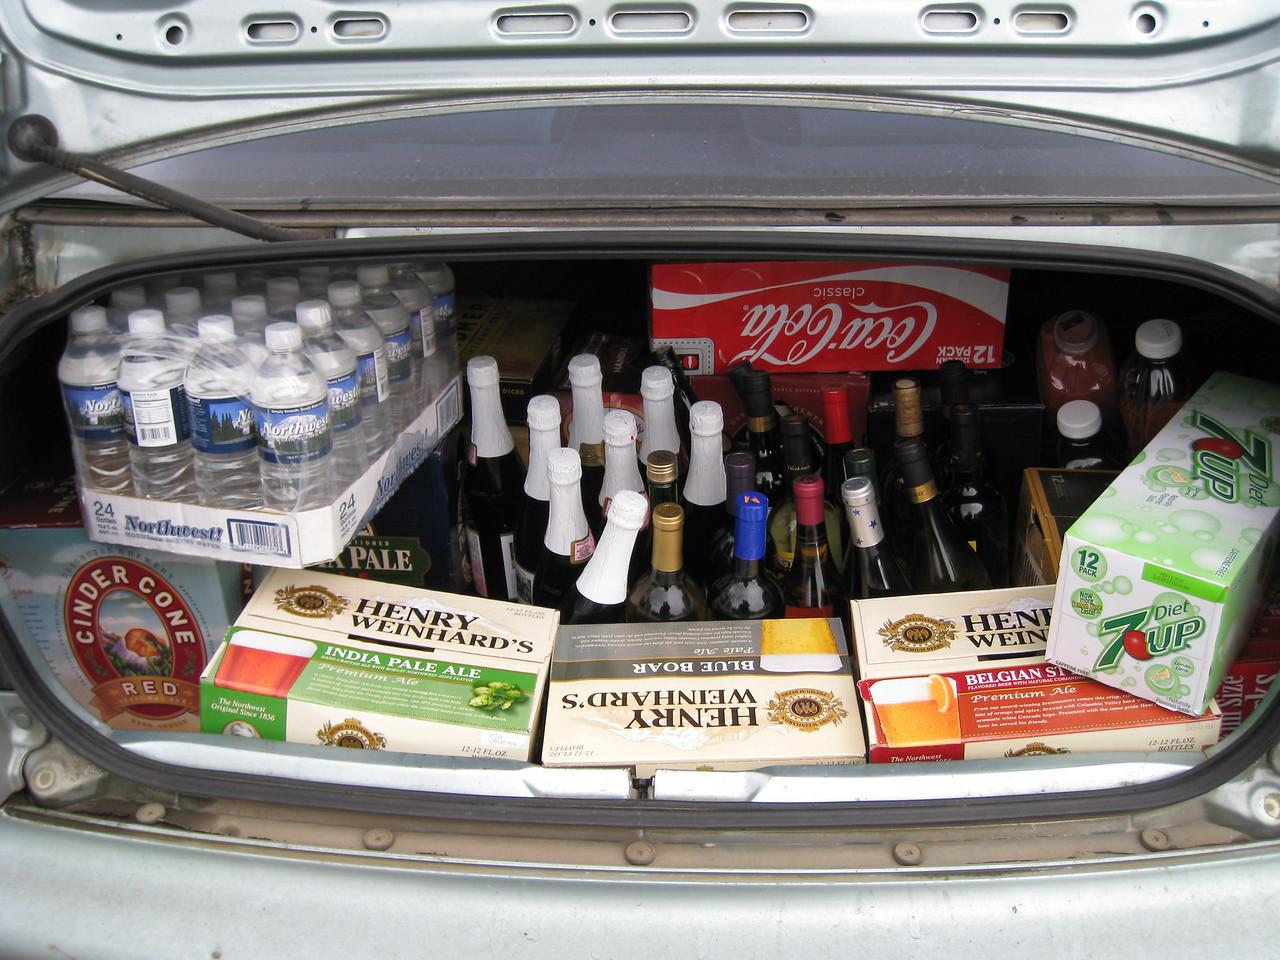 Wedding Reception Booze!!! April 19th 2008